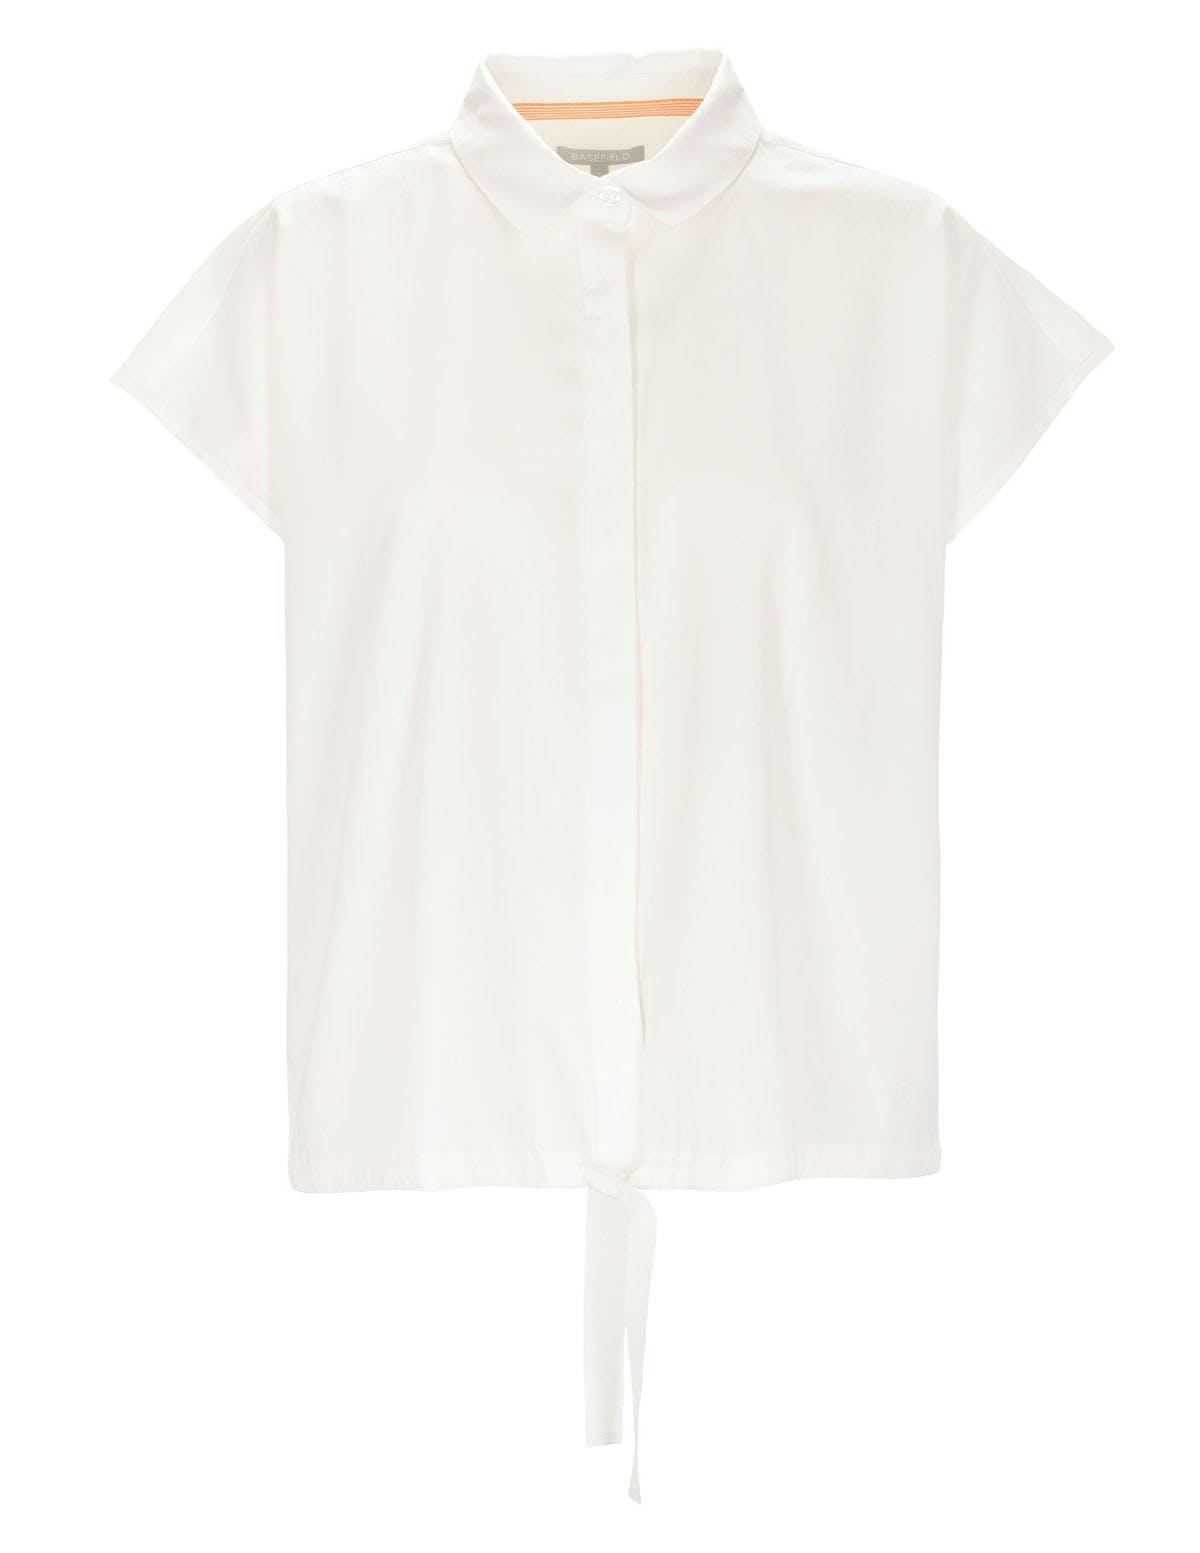 ORGANIC COTTON Bluse mit Tunnelzug - Coco White